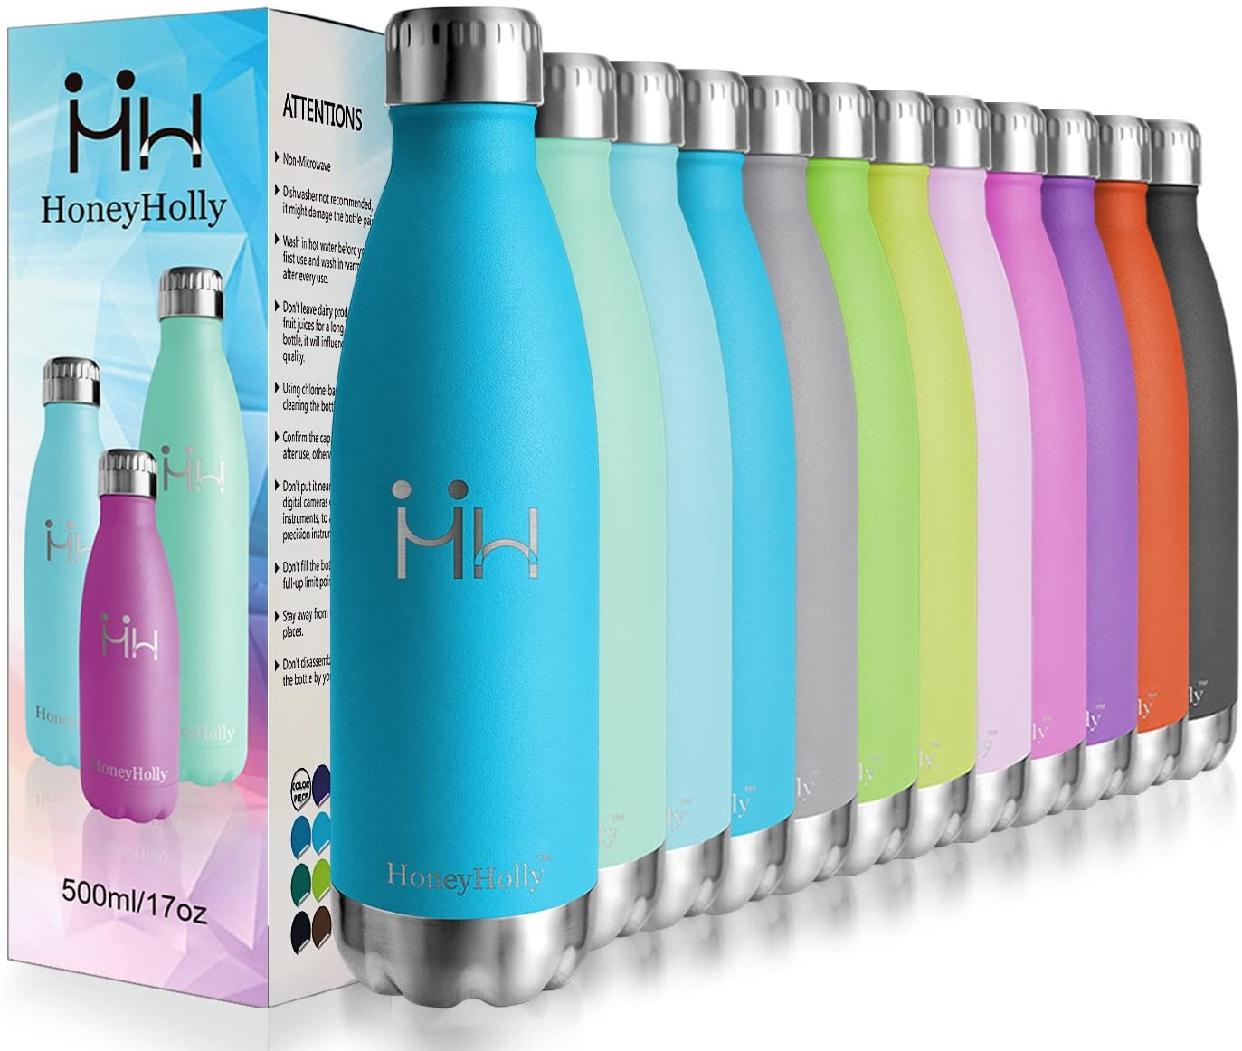 HoneyHolly(ハニーホリー) 真空断熱ボトル 350ml スカイブルーの商品画像